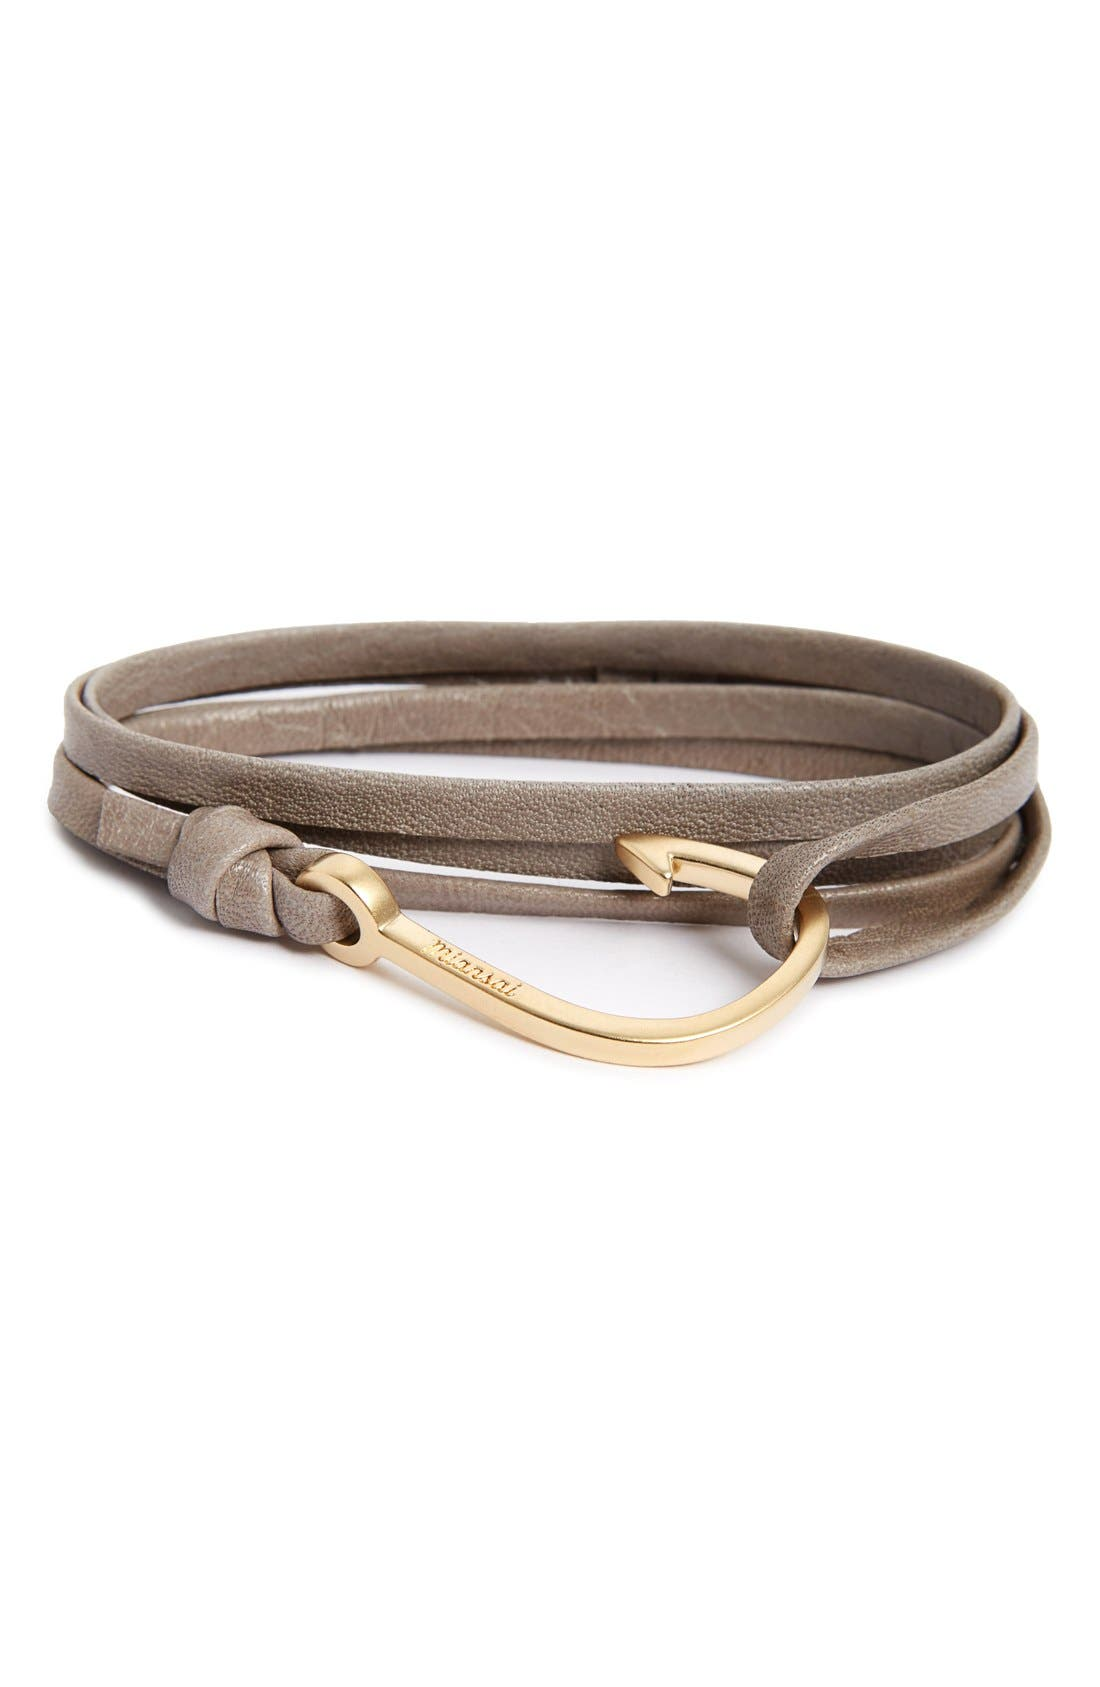 Hook On Leather Wrap Bracelet,                         Main,                         color,